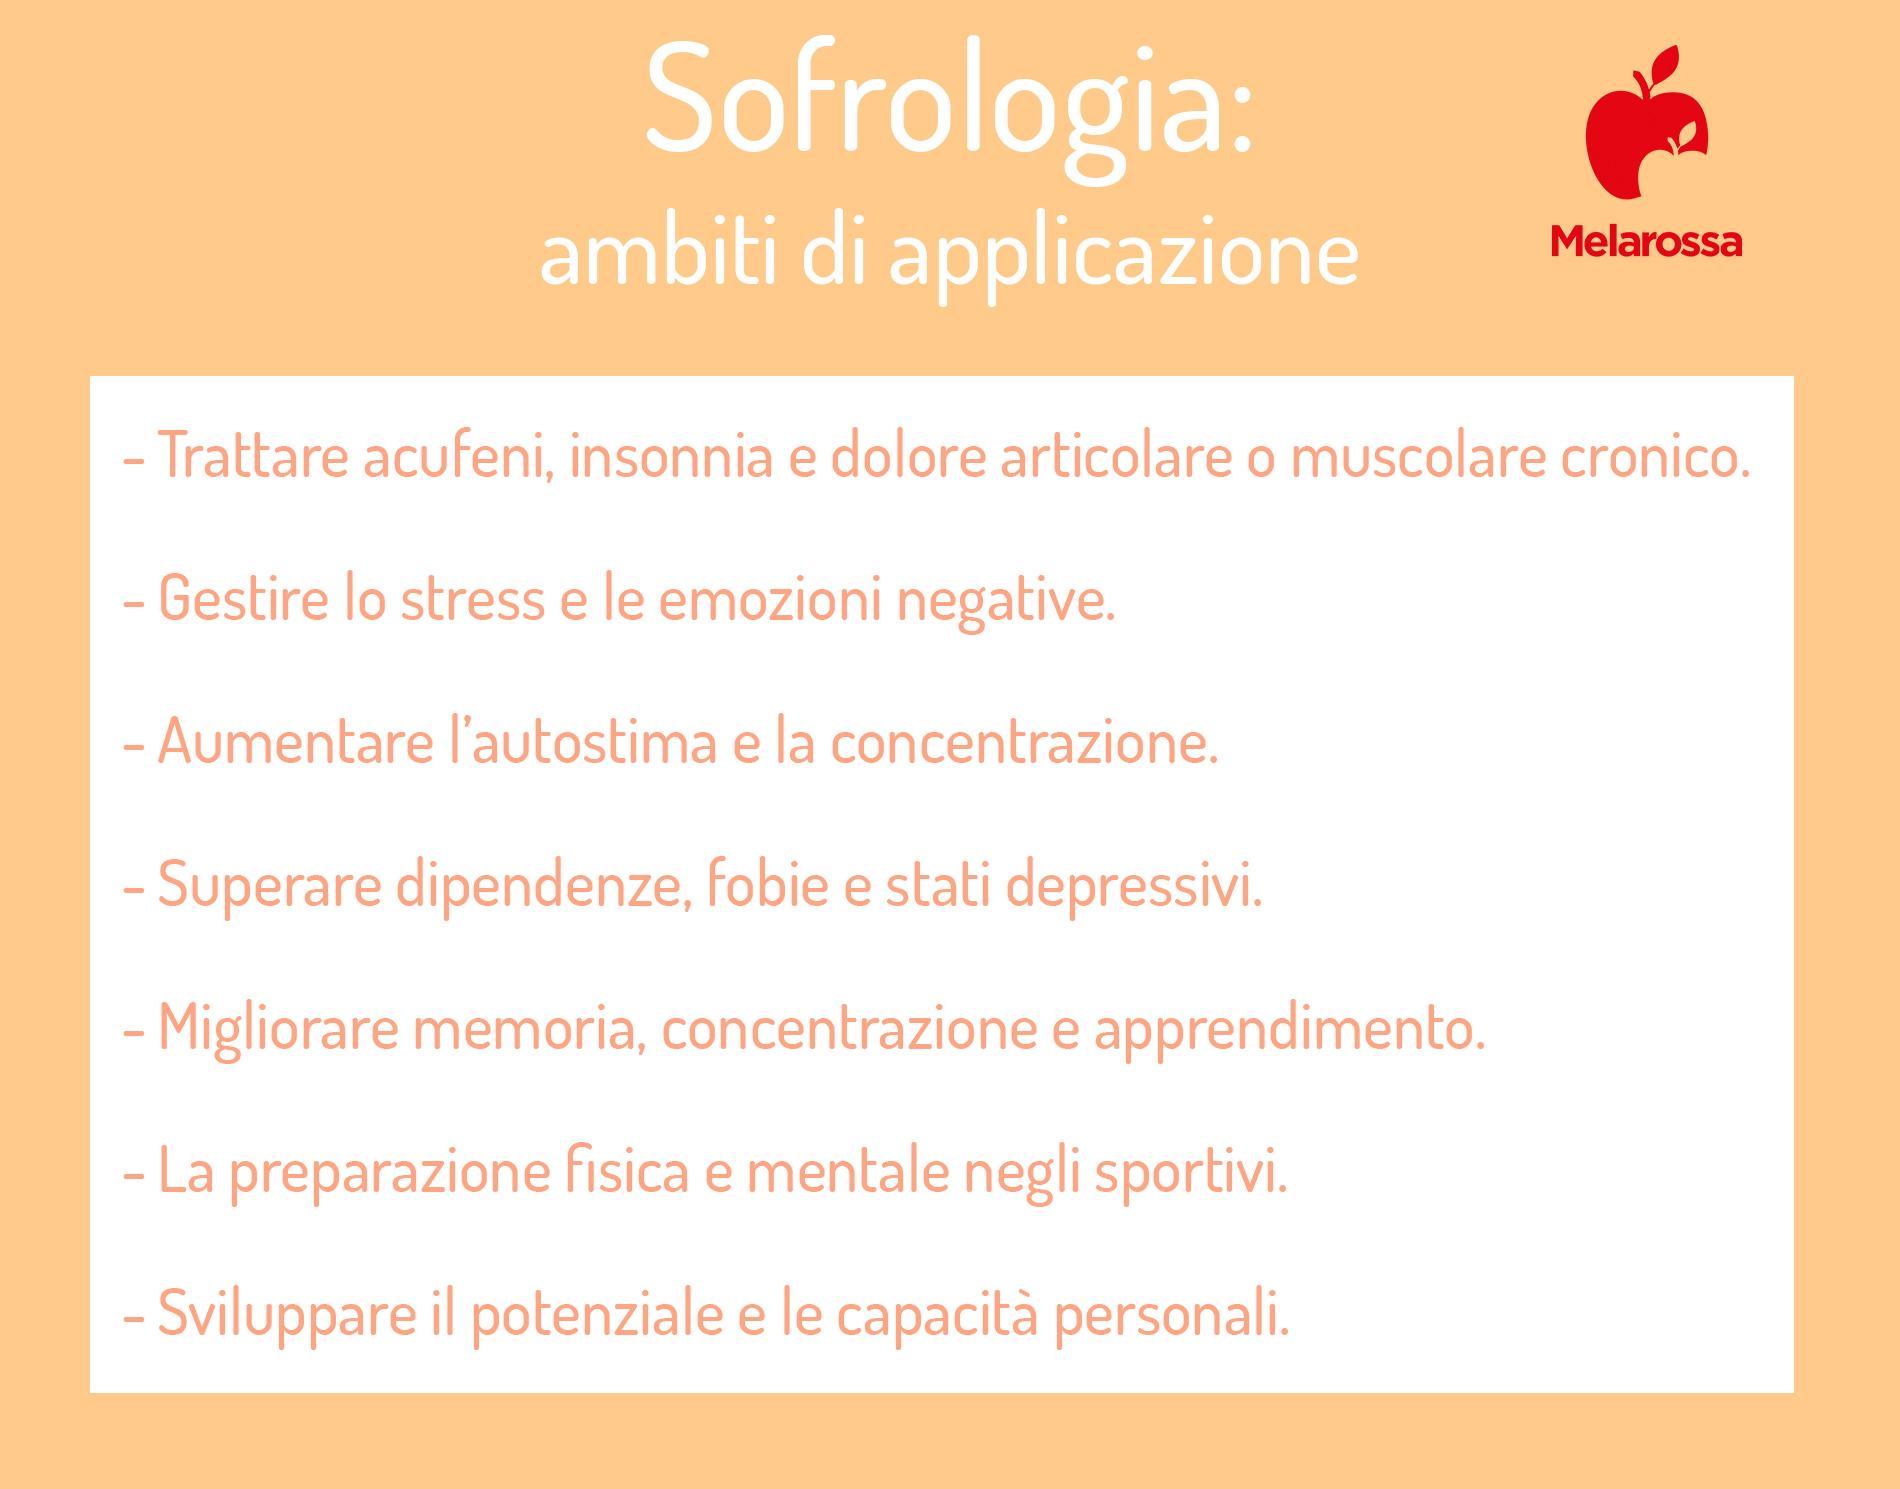 sofrologia: ambiti di applicazione